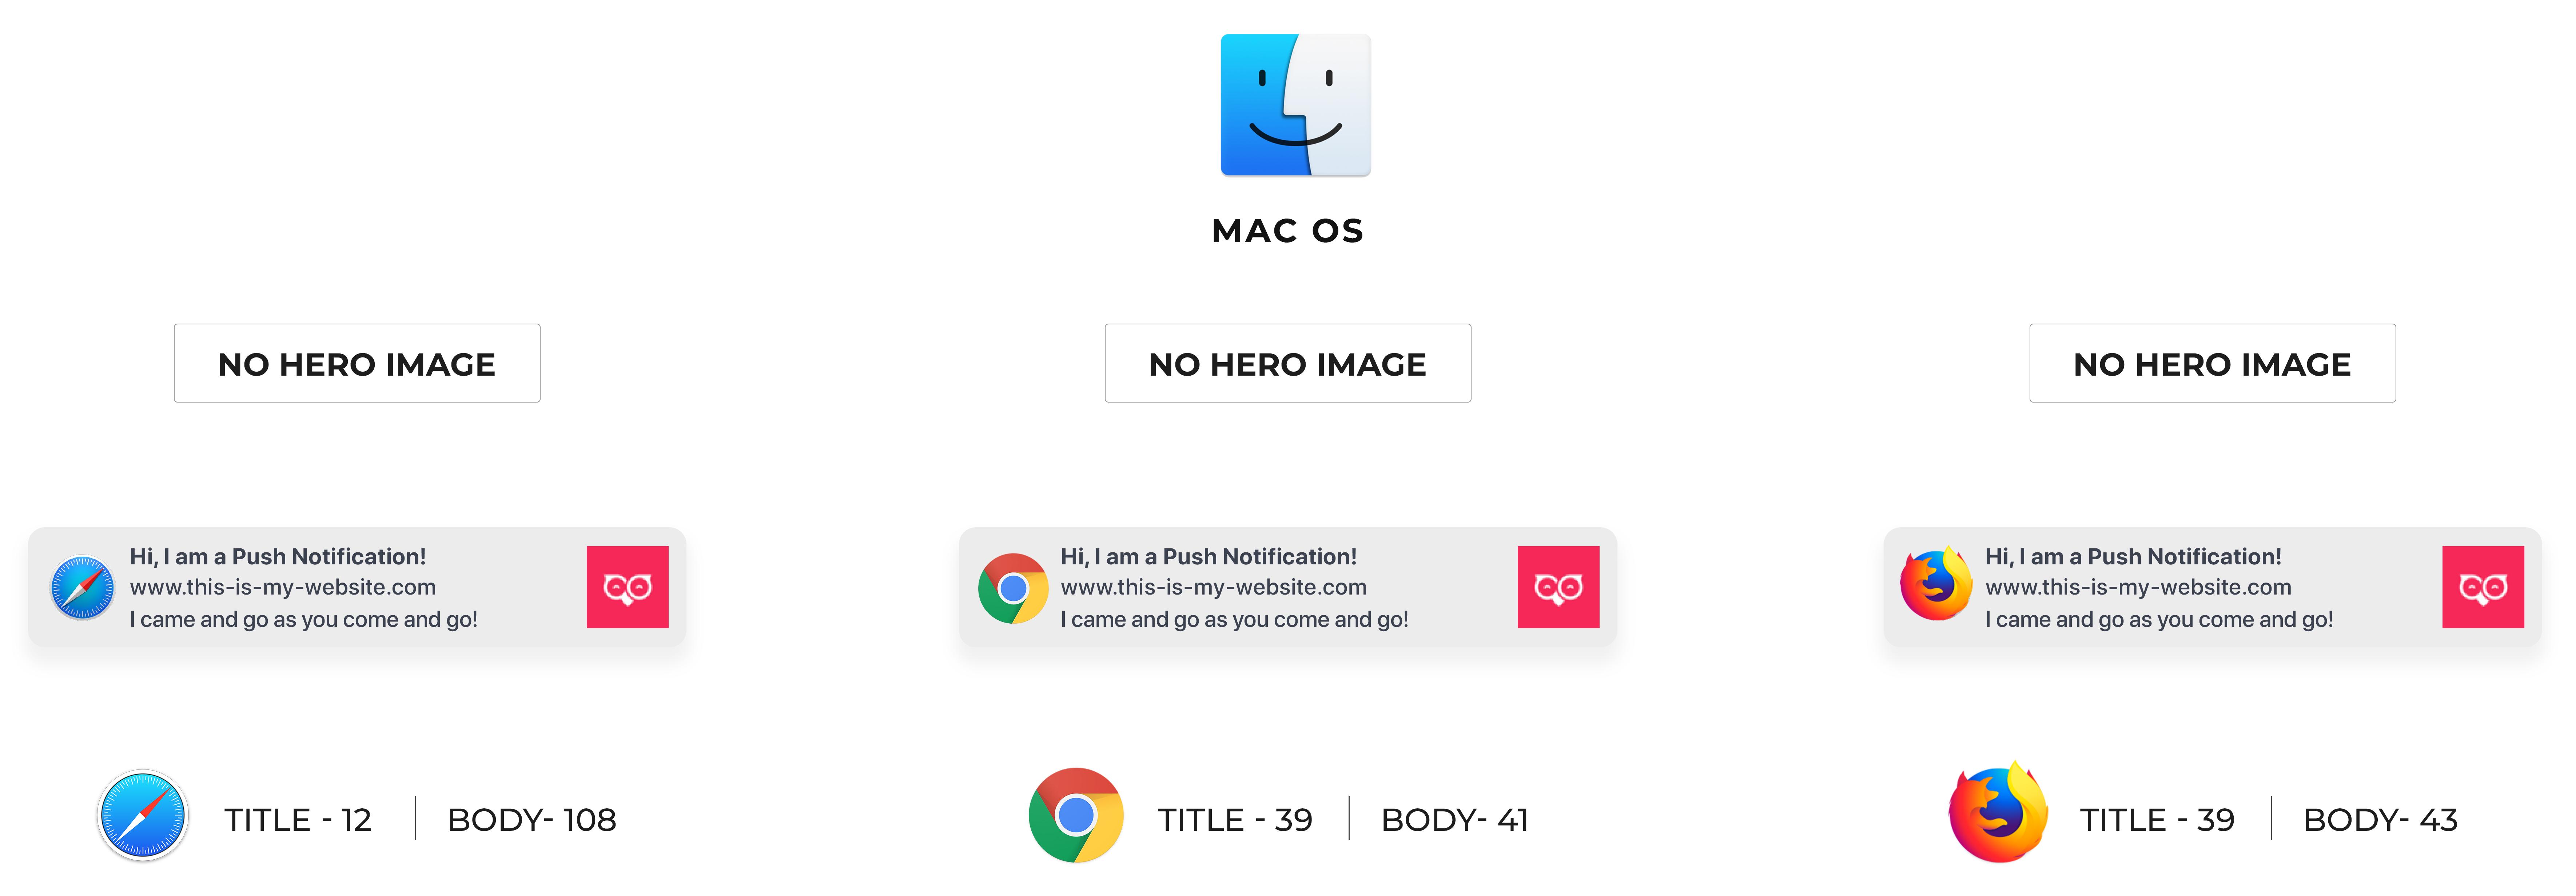 push notification length for mac chrome, safari, and firefox